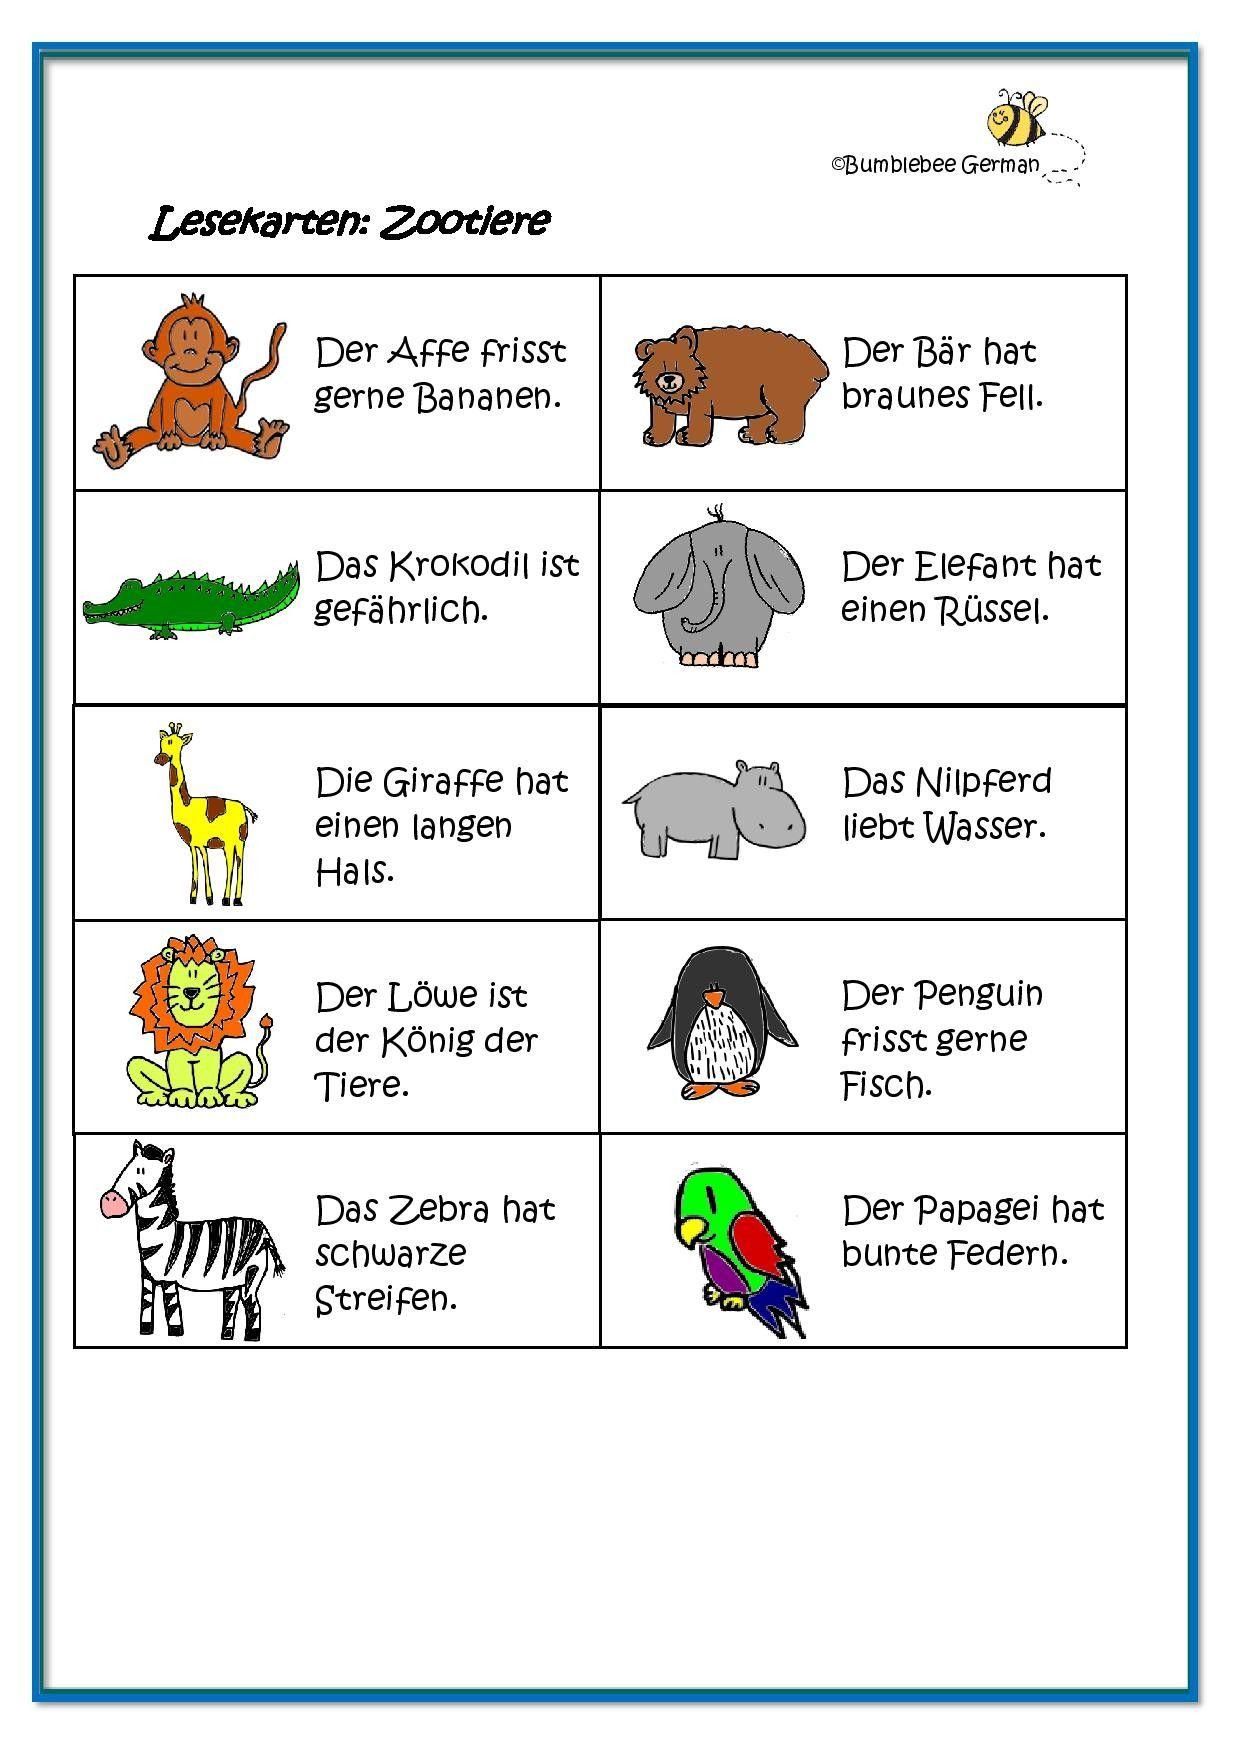 worksheet german for kids zoo animals zootiere lesekarten reading cards german for kids. Black Bedroom Furniture Sets. Home Design Ideas